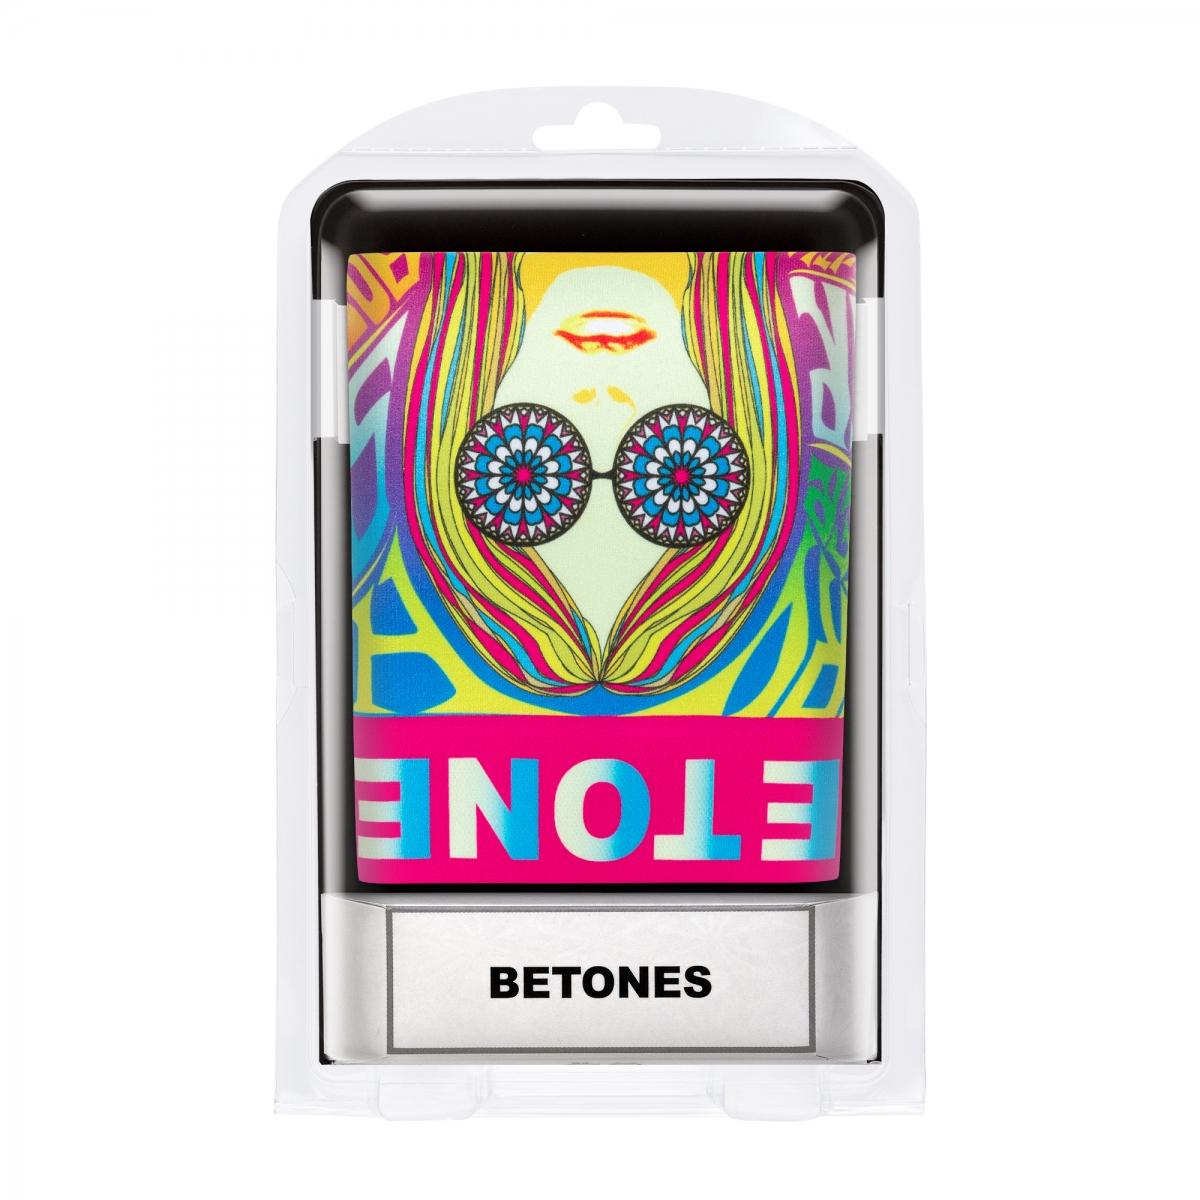 BETONES ボクサーパンツ KAROLINA-KOI001 PINK